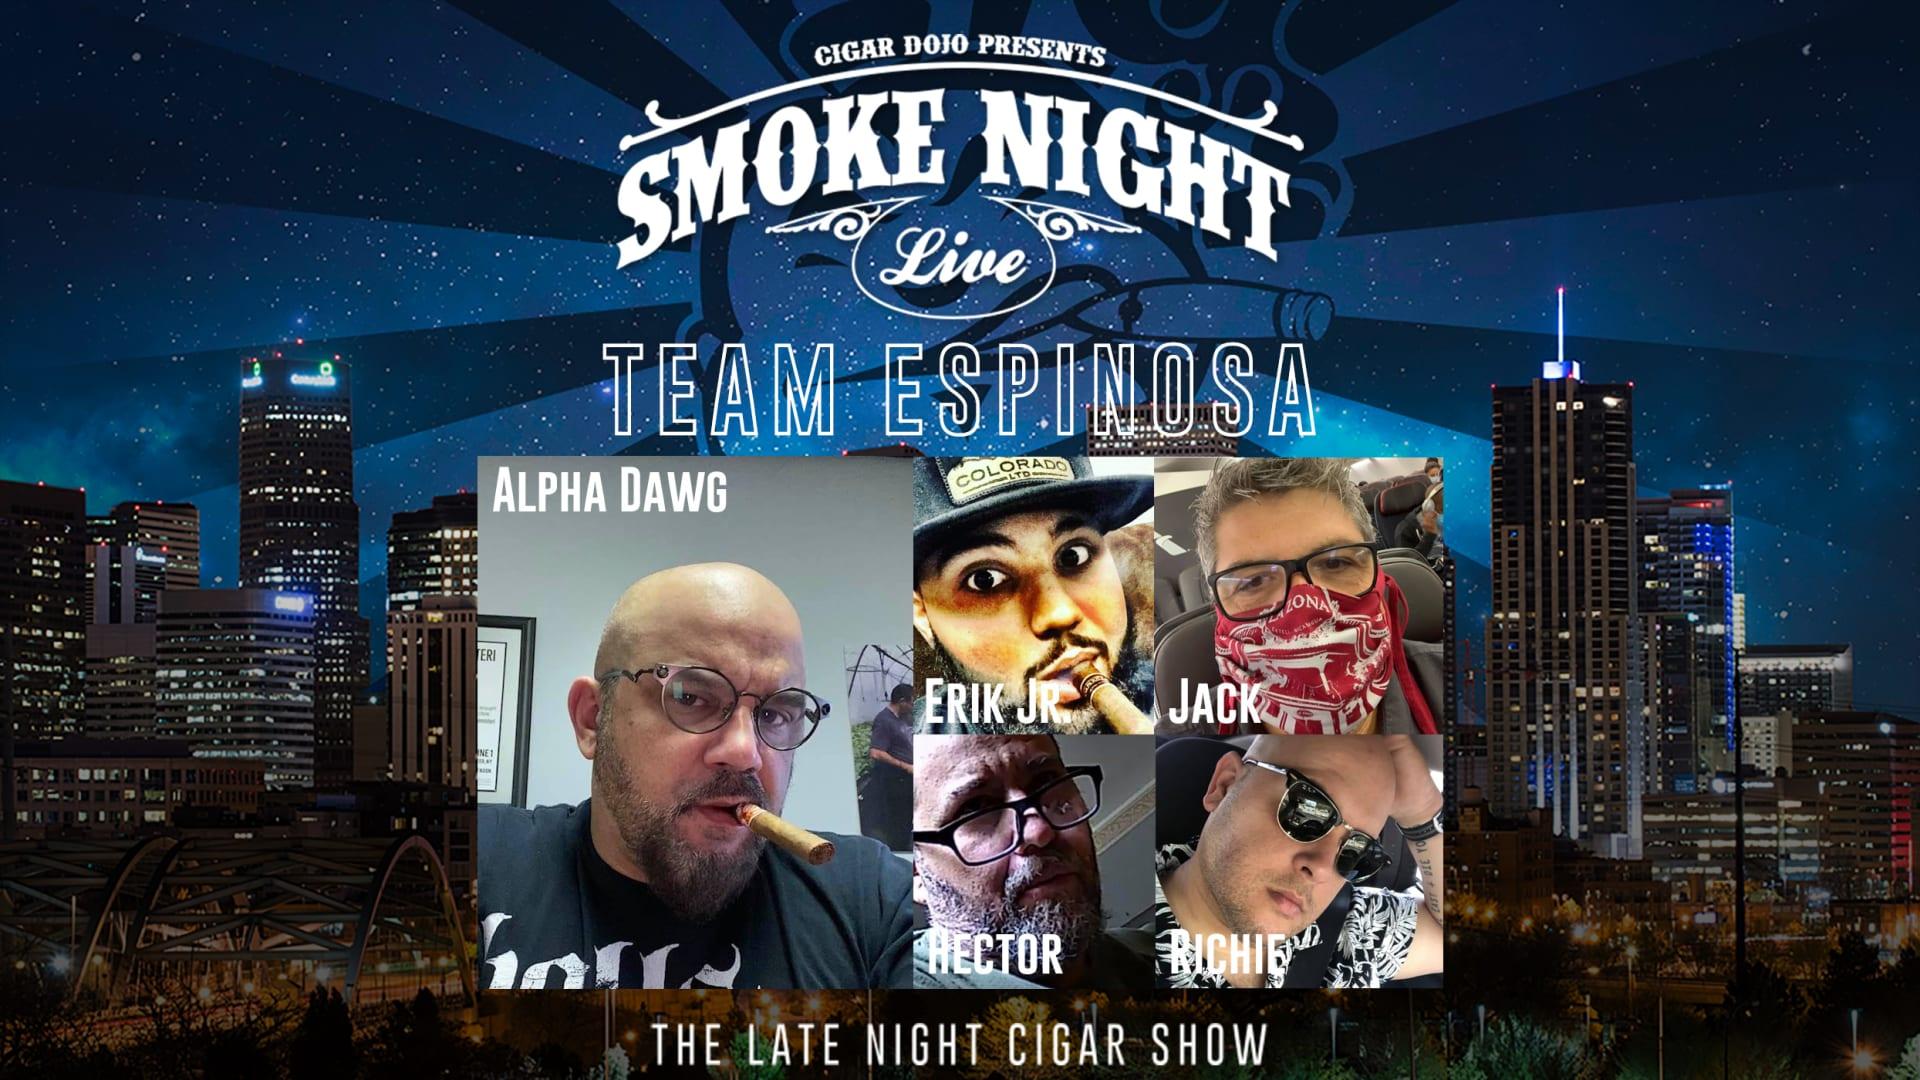 Smoke Night LIVE – Team Espinosa Featured Image